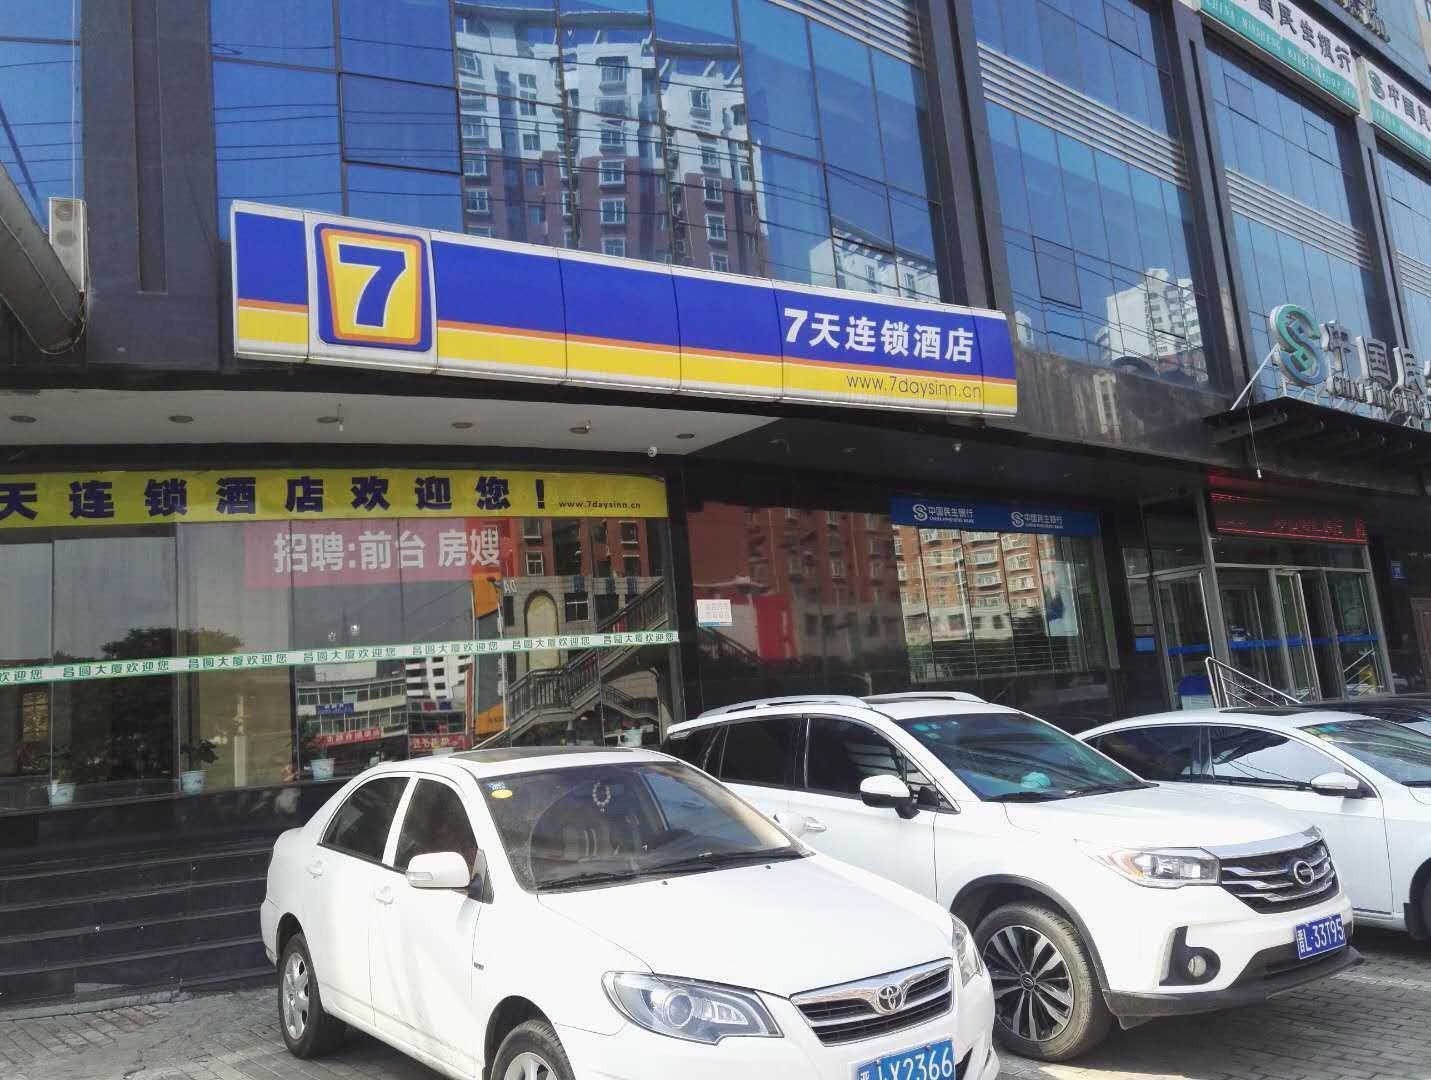 7 Days Inn·Lvliang Bus Terminal, Luliang